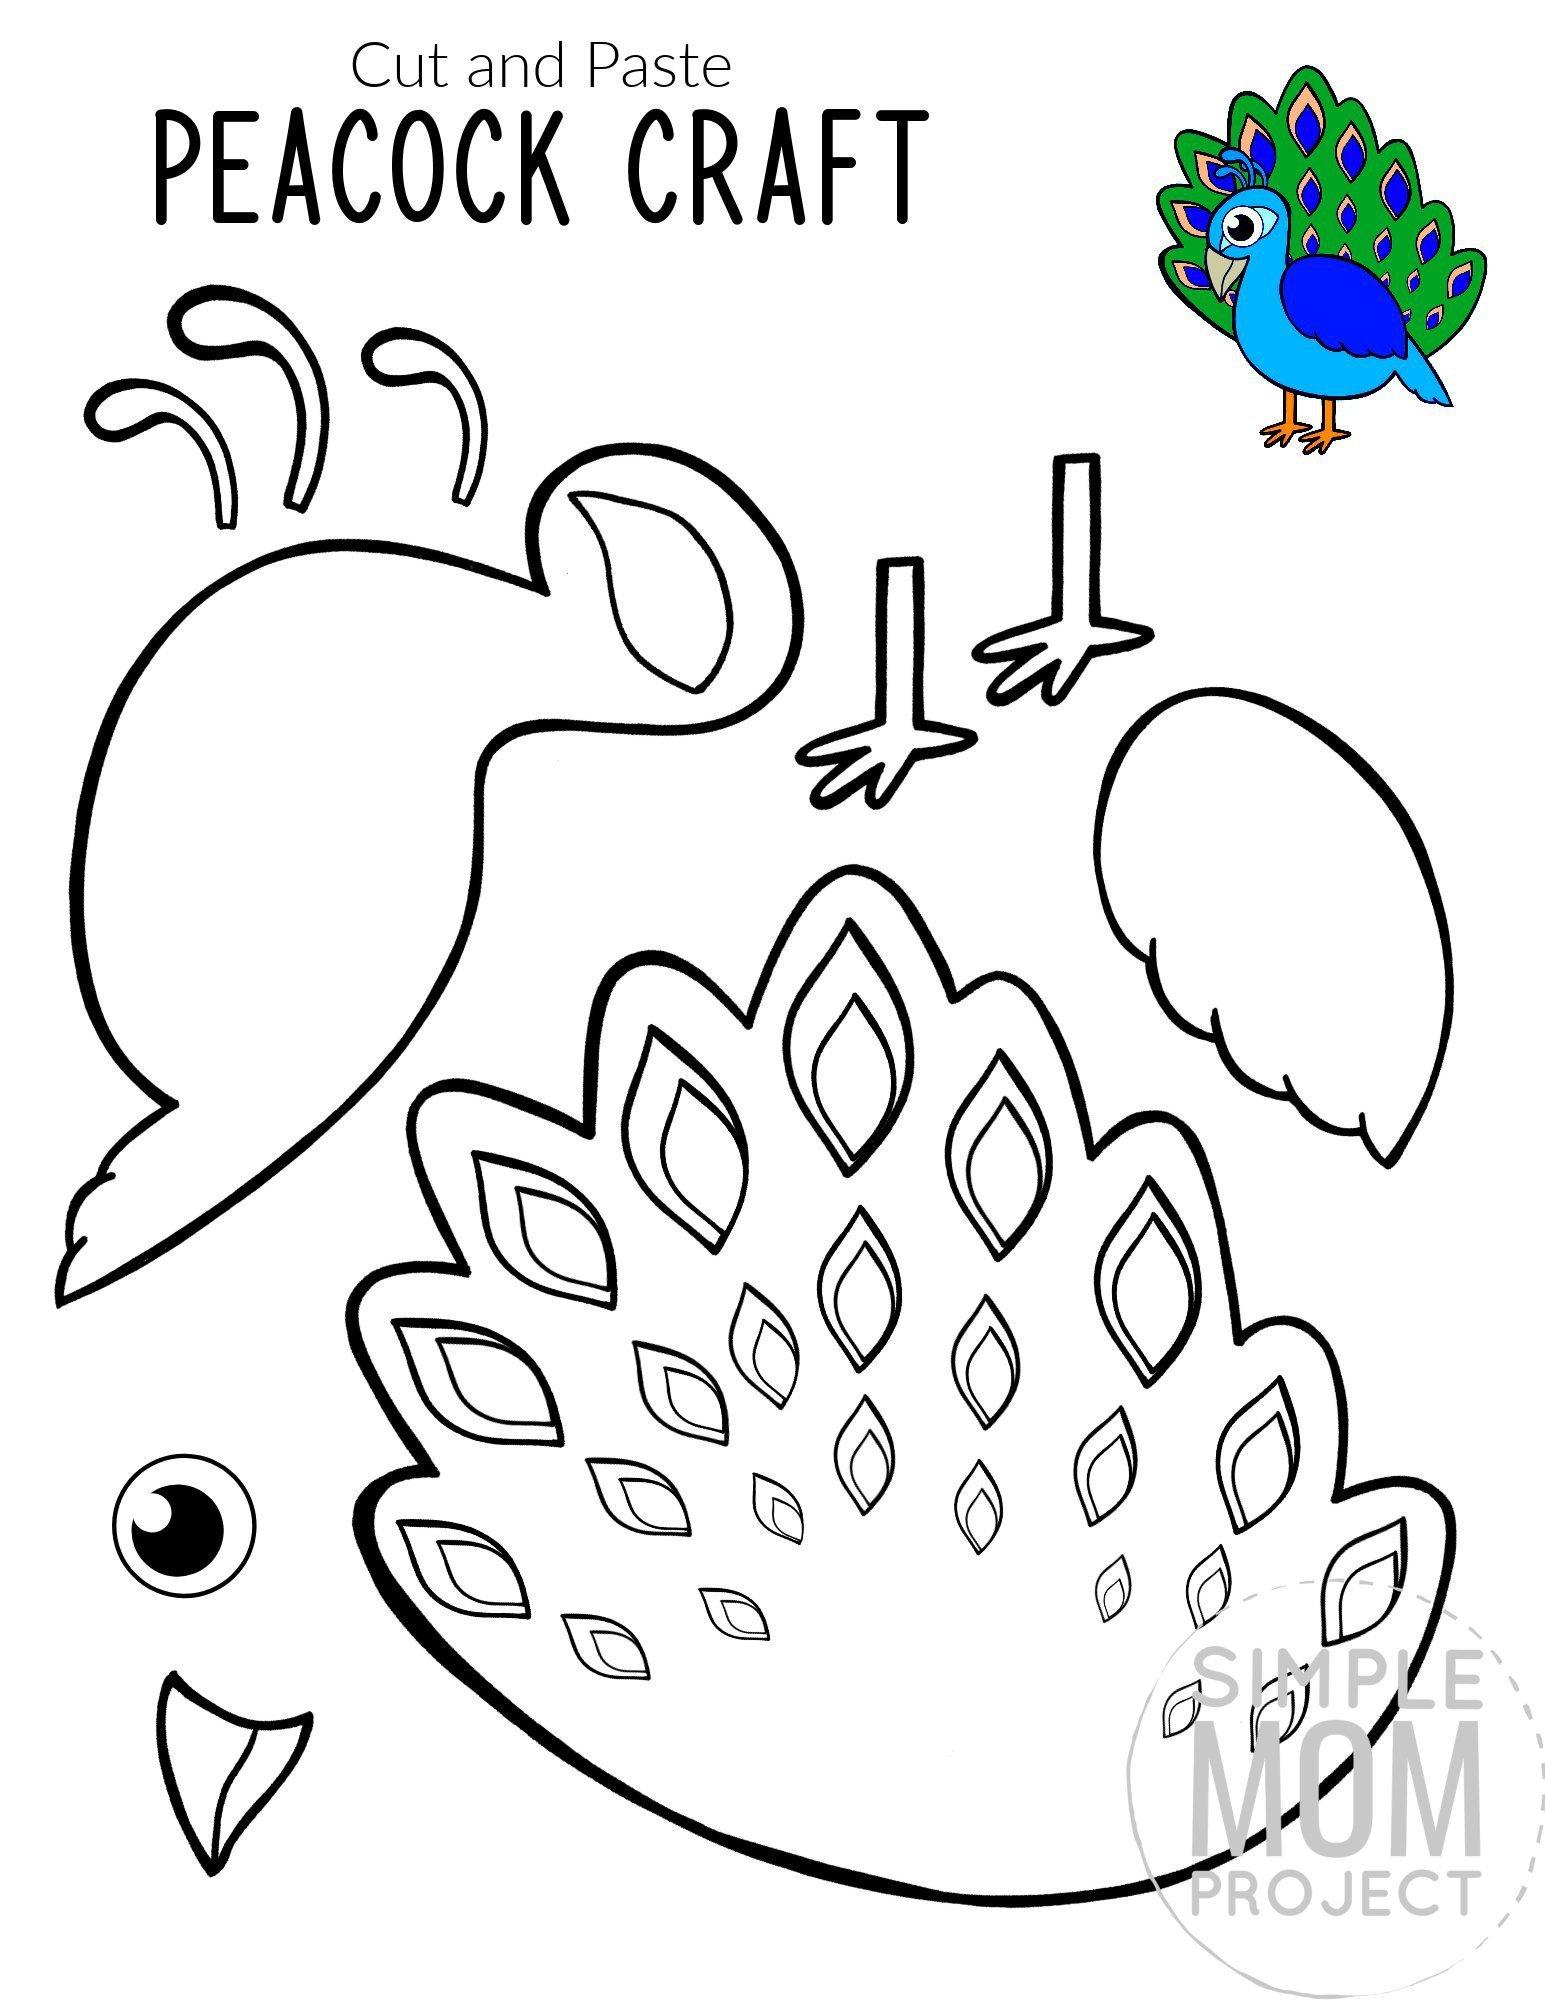 Printable Peacock Craft for Kids, preschoolers toddlers and kindergartners